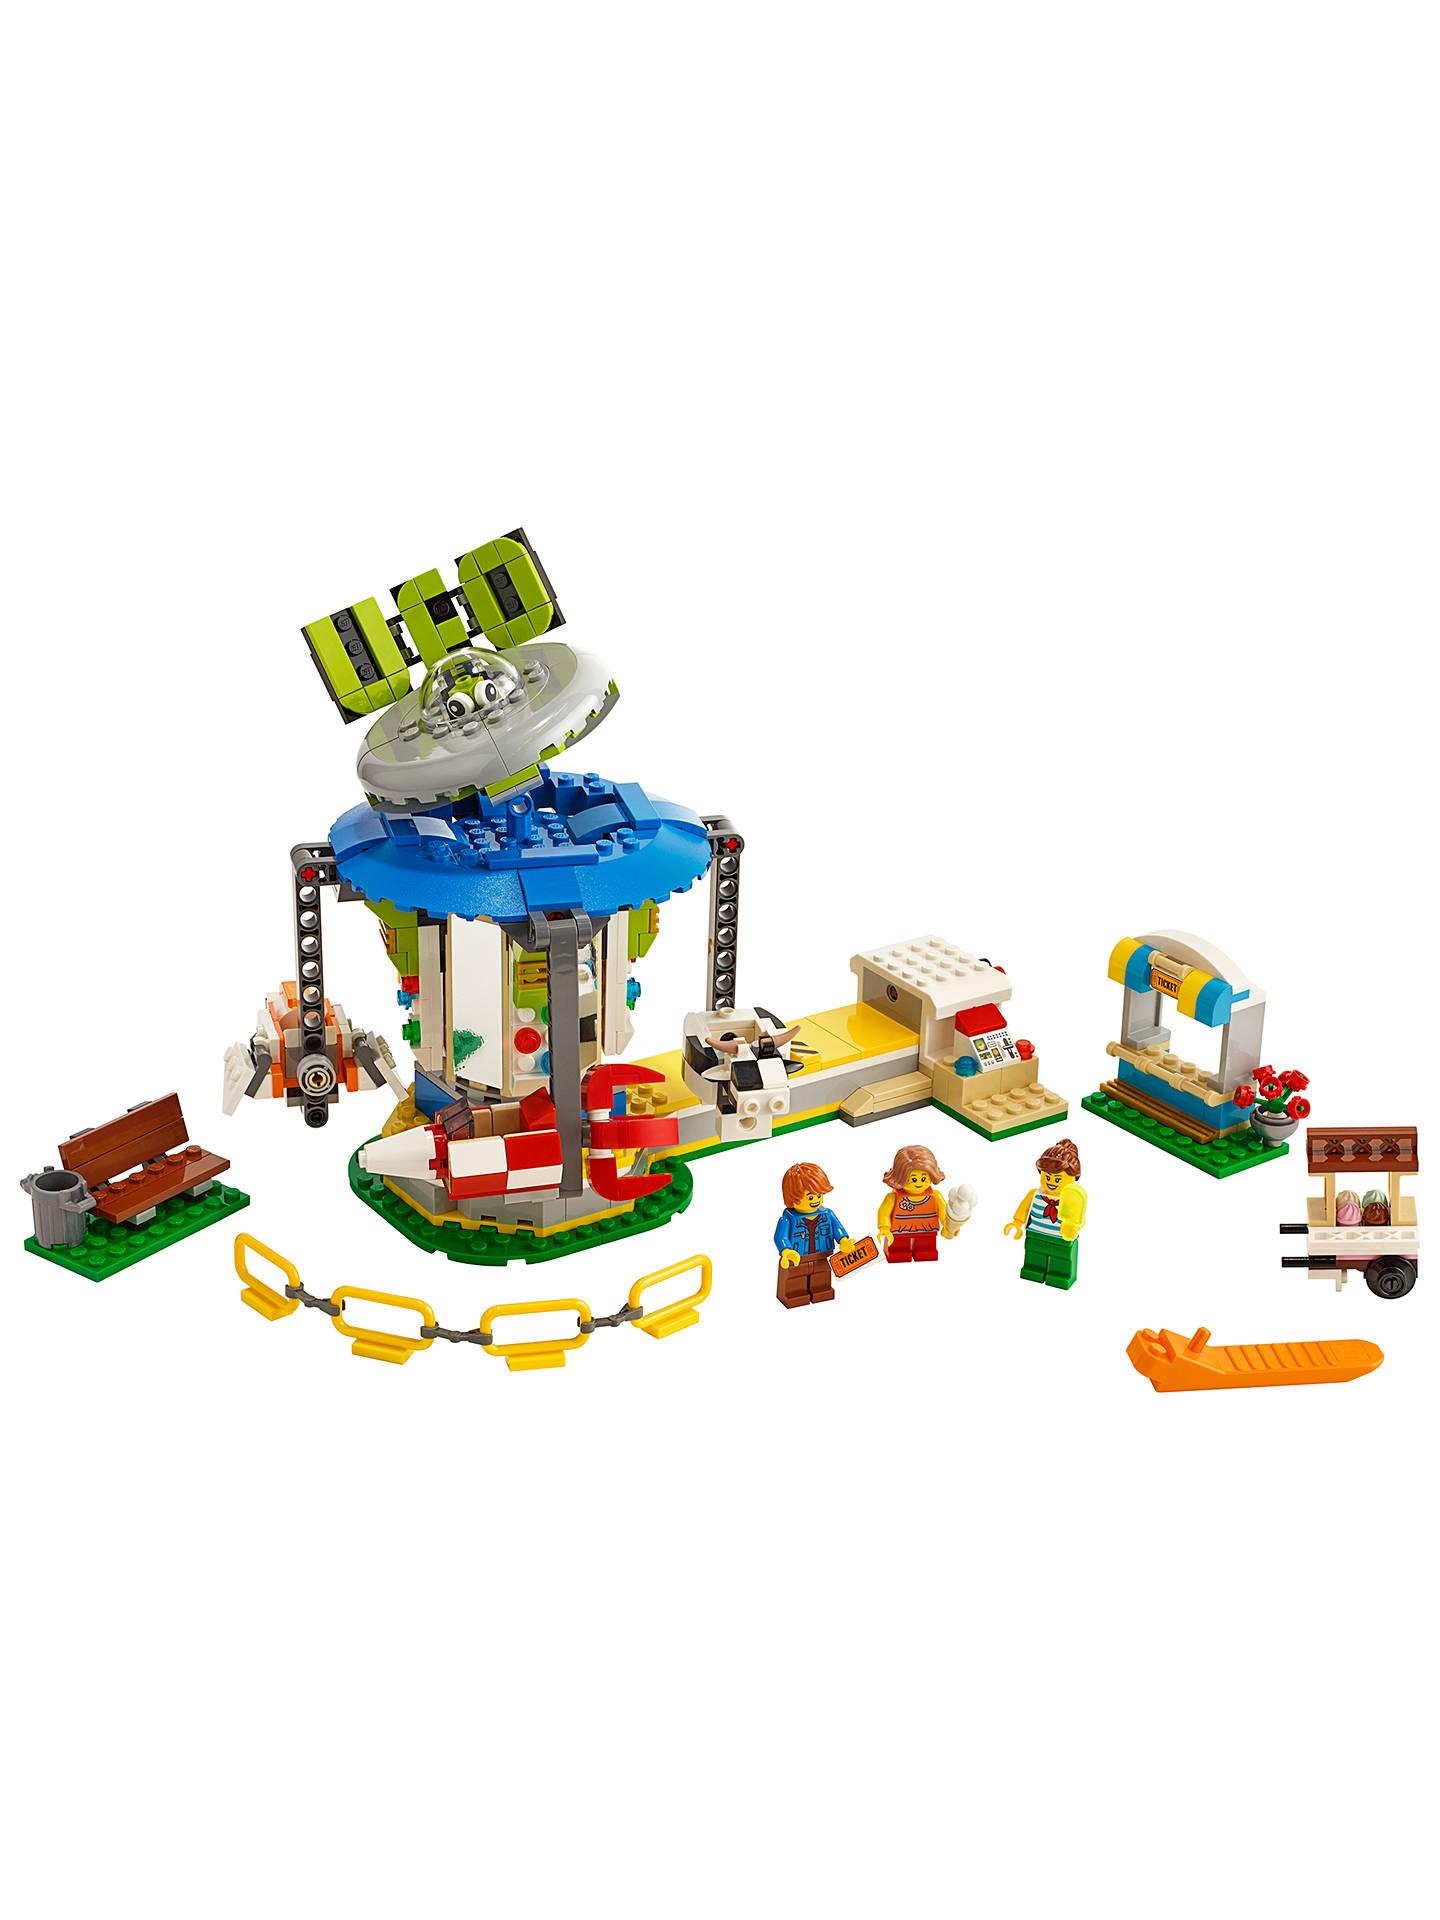 Lego Harry Potter Minifigure Red School Book Vines/&Mushroom 4728 5378 100/% REAL